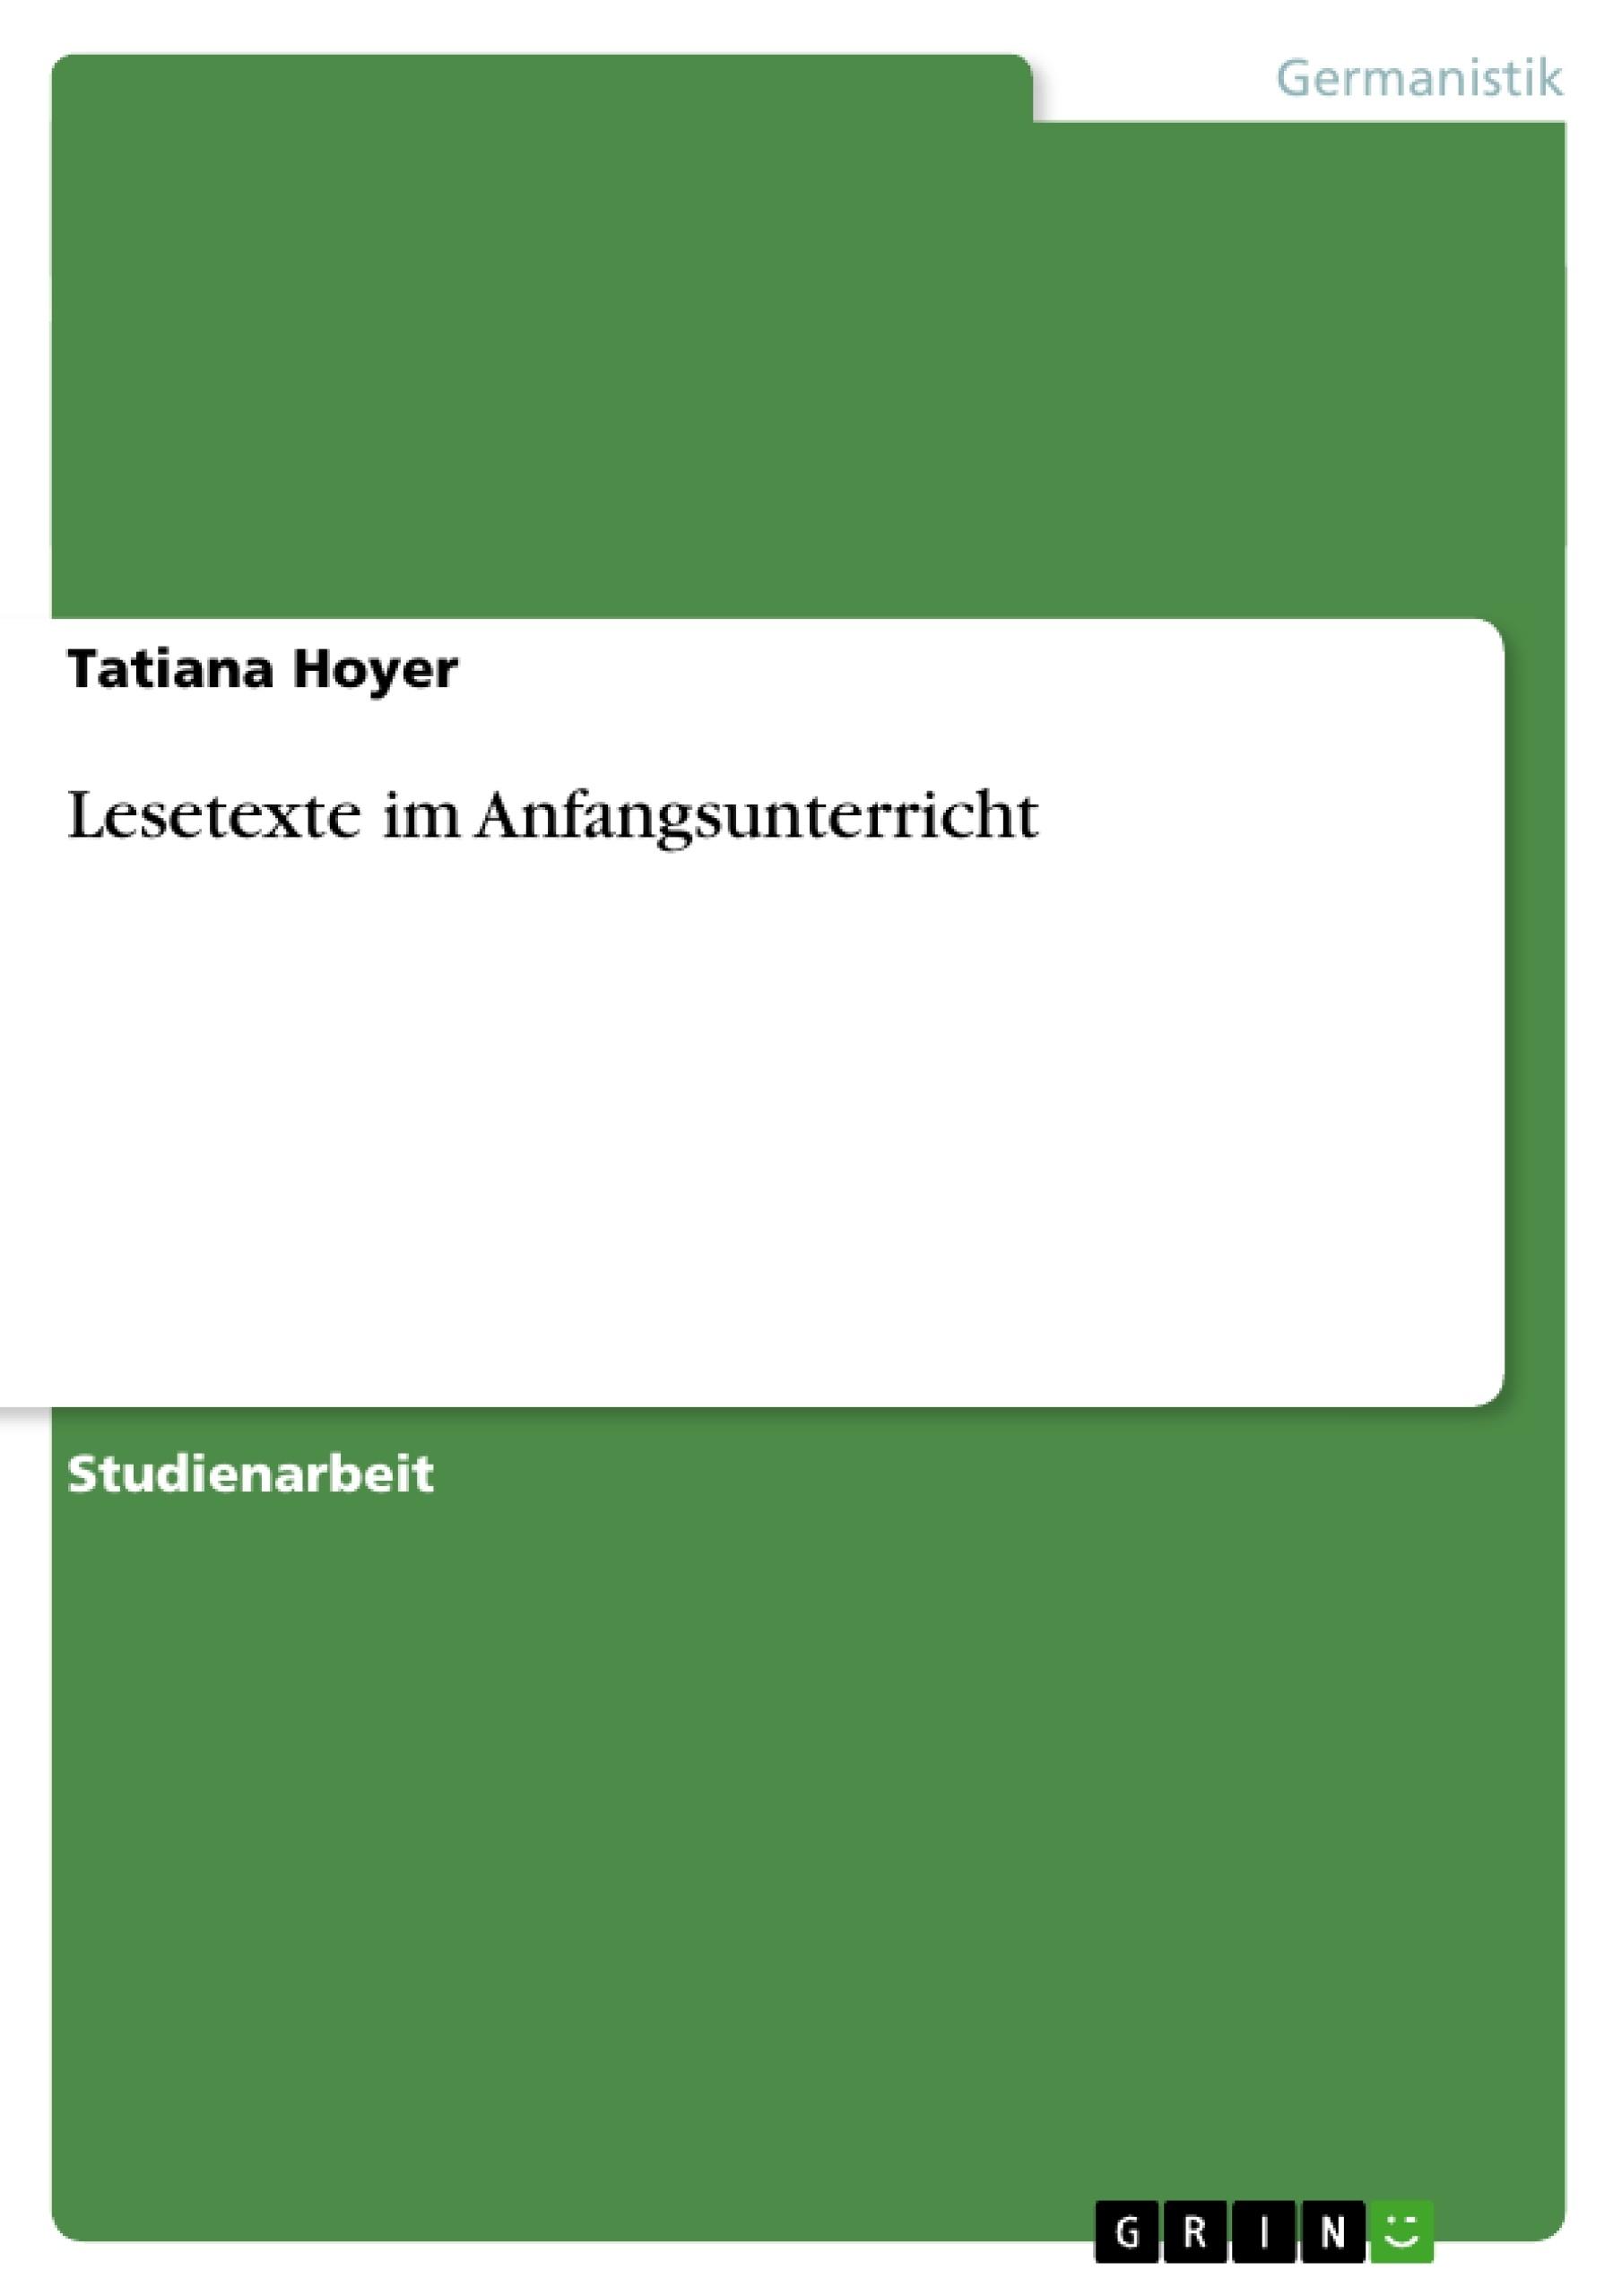 Titel: Lesetexte im Anfangsunterricht